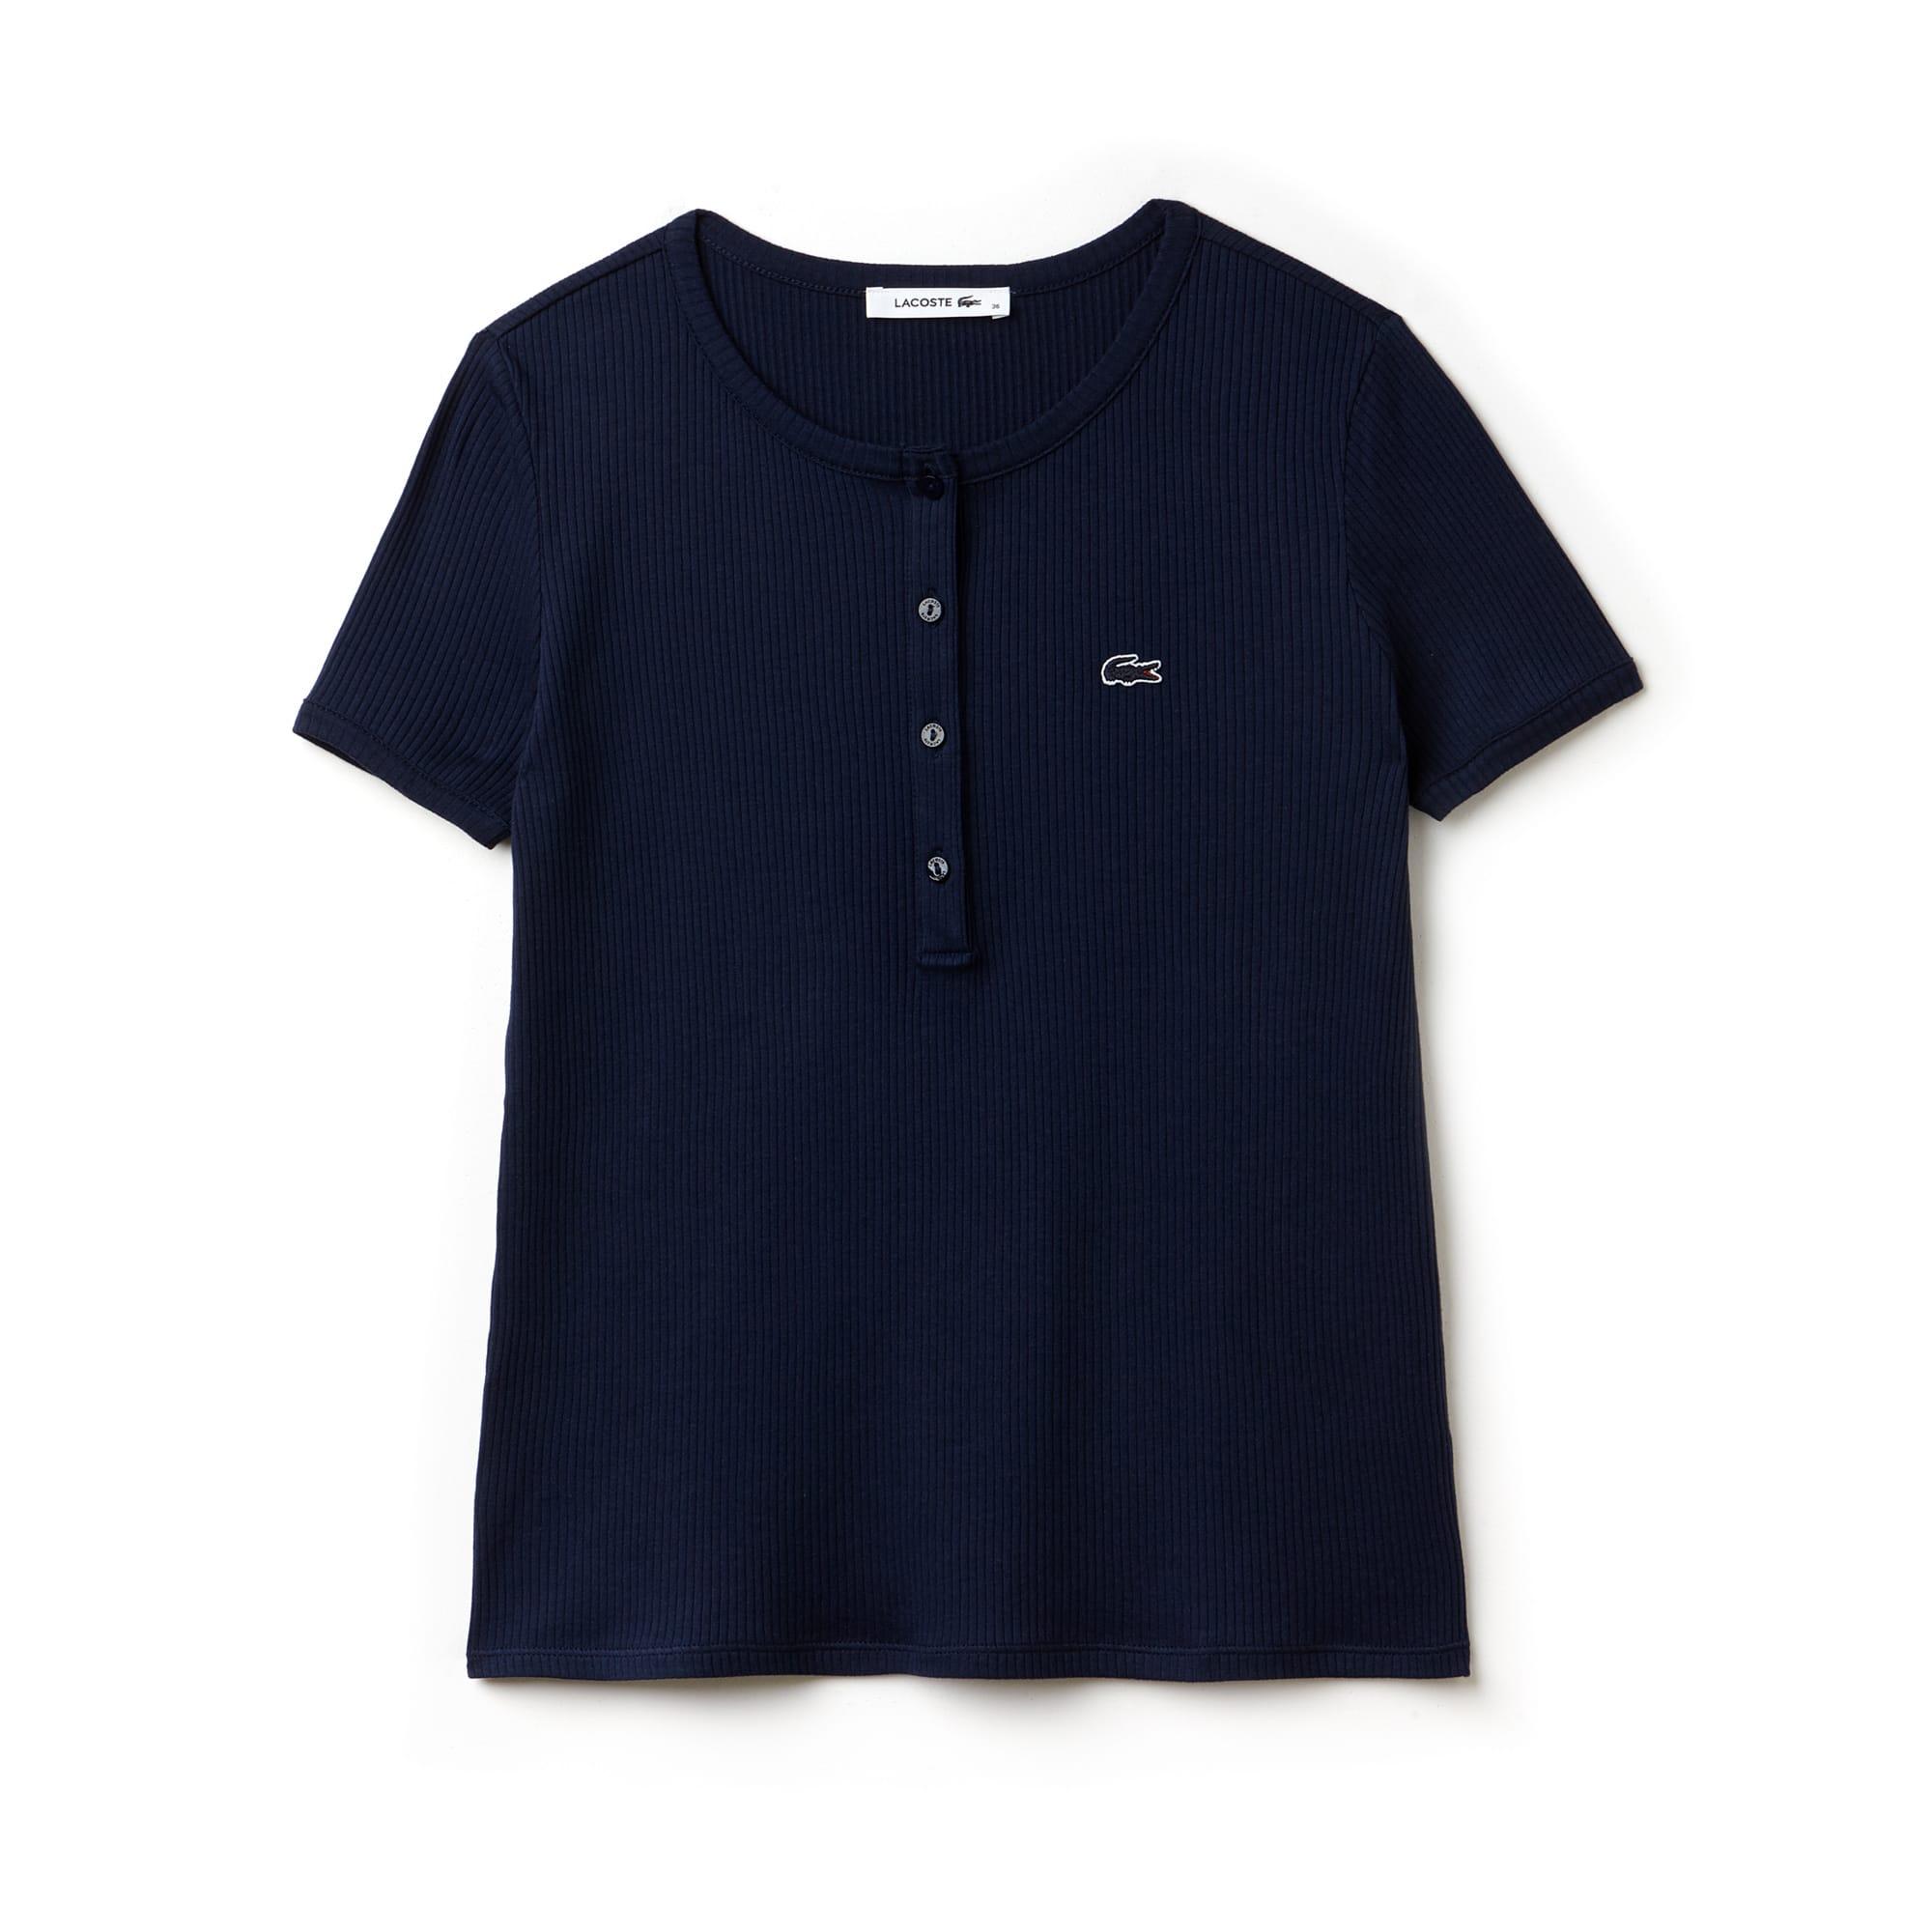 Women's Buttoned Ribbed Crew Neck Cotton Blend T-Shirt